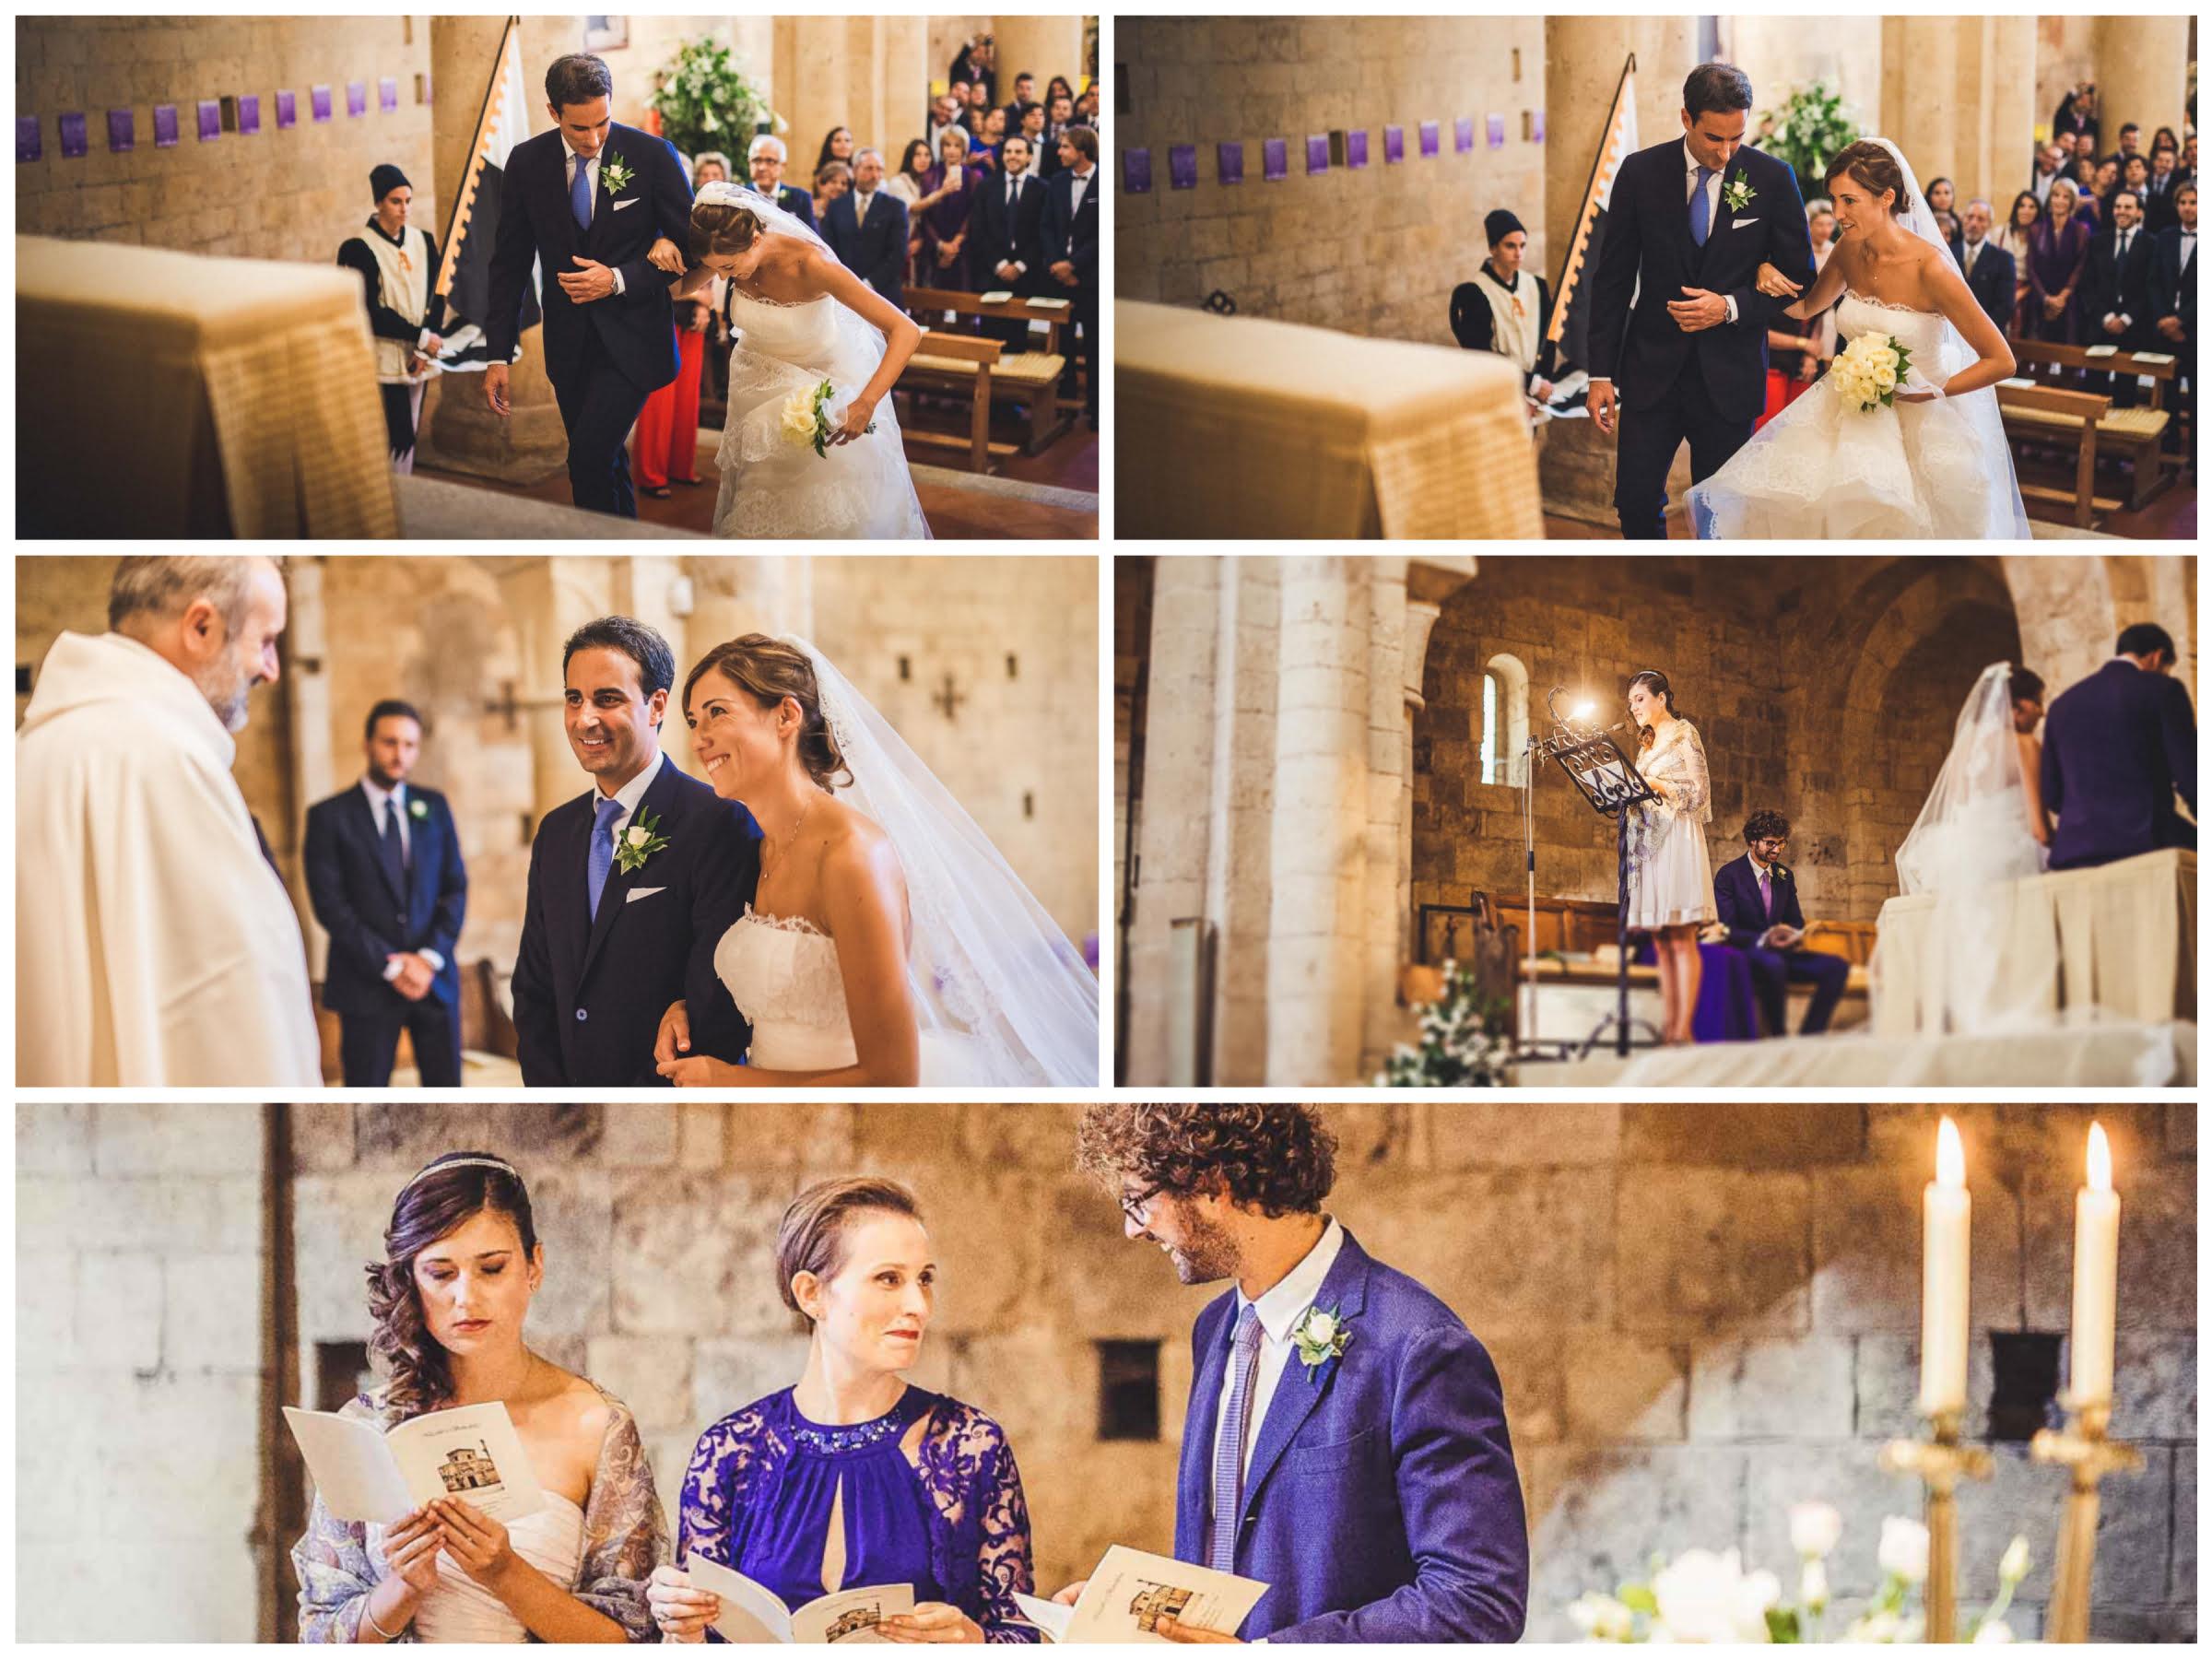 fotografo matrimonio siena-5_Fotor_Collage